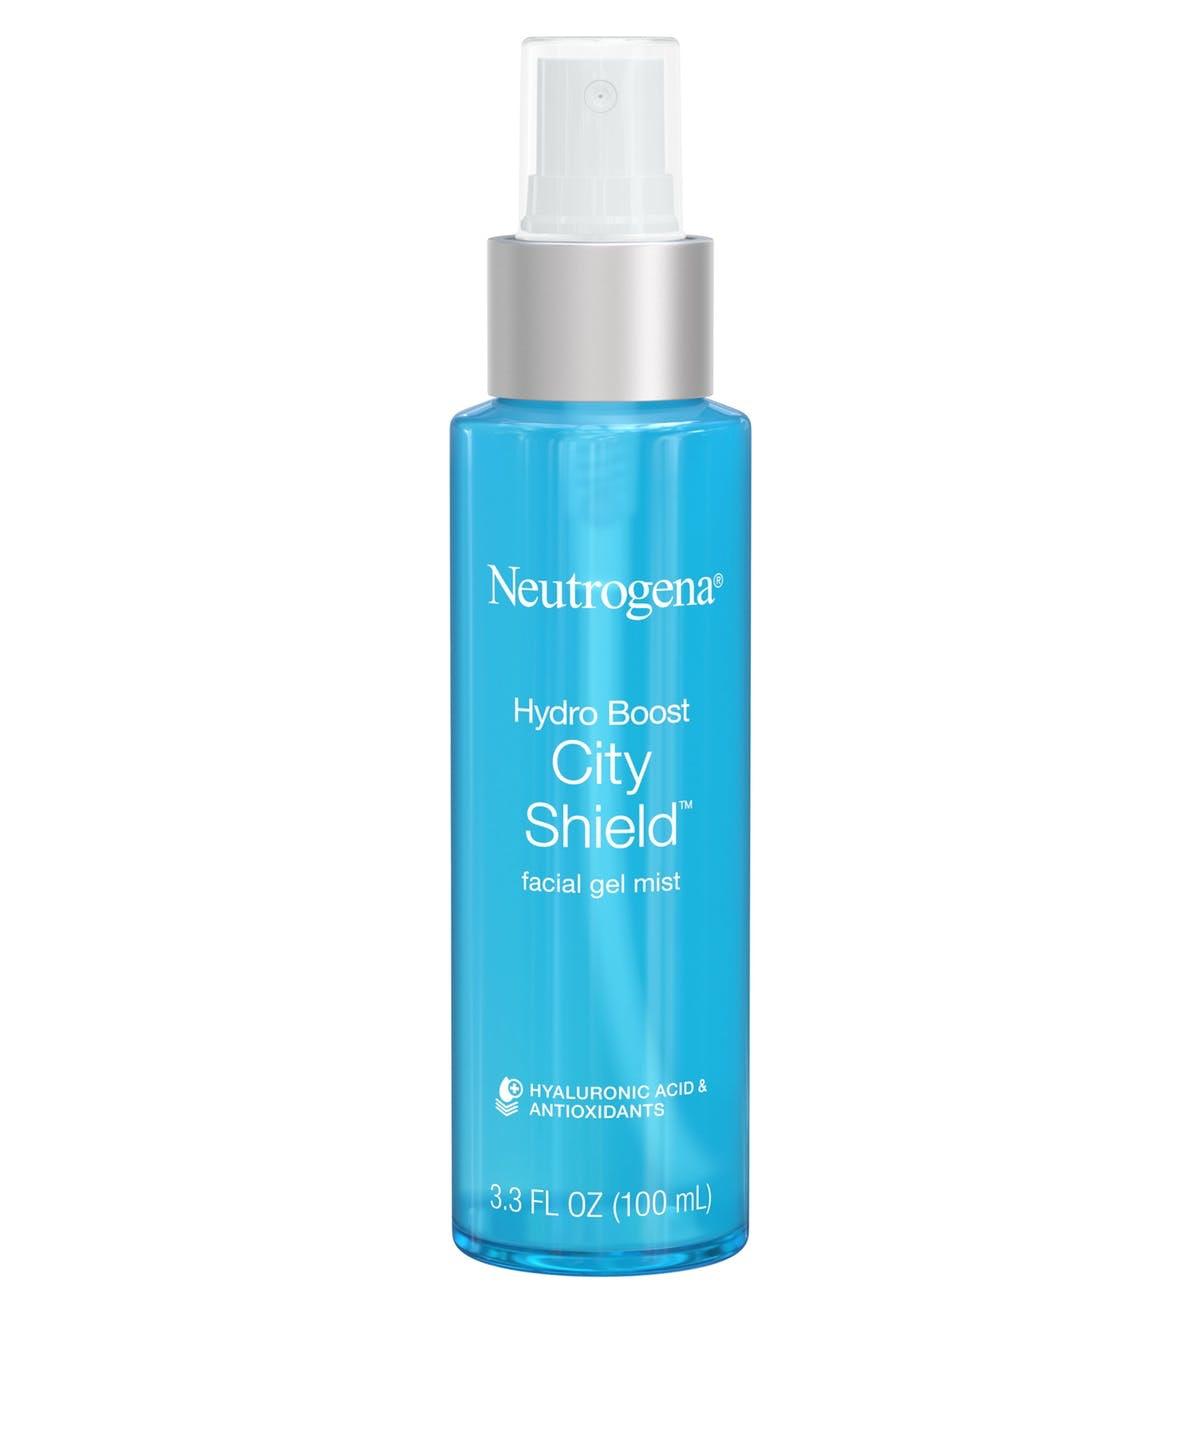 Hydro Boost City Shield Facial Gel Mist